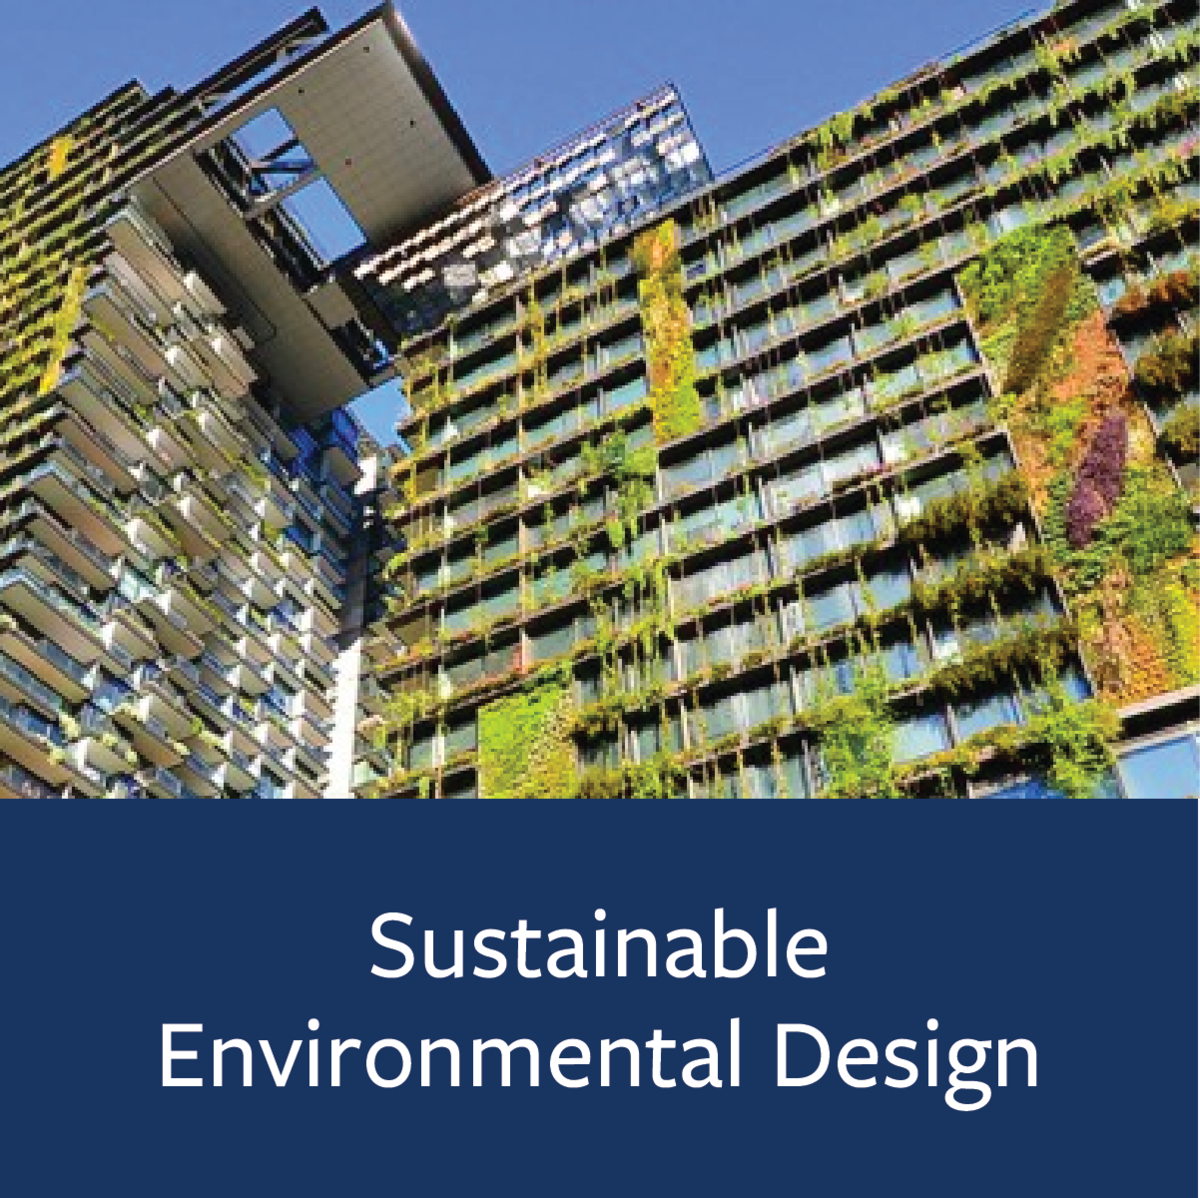 Sustainable Environmental Design